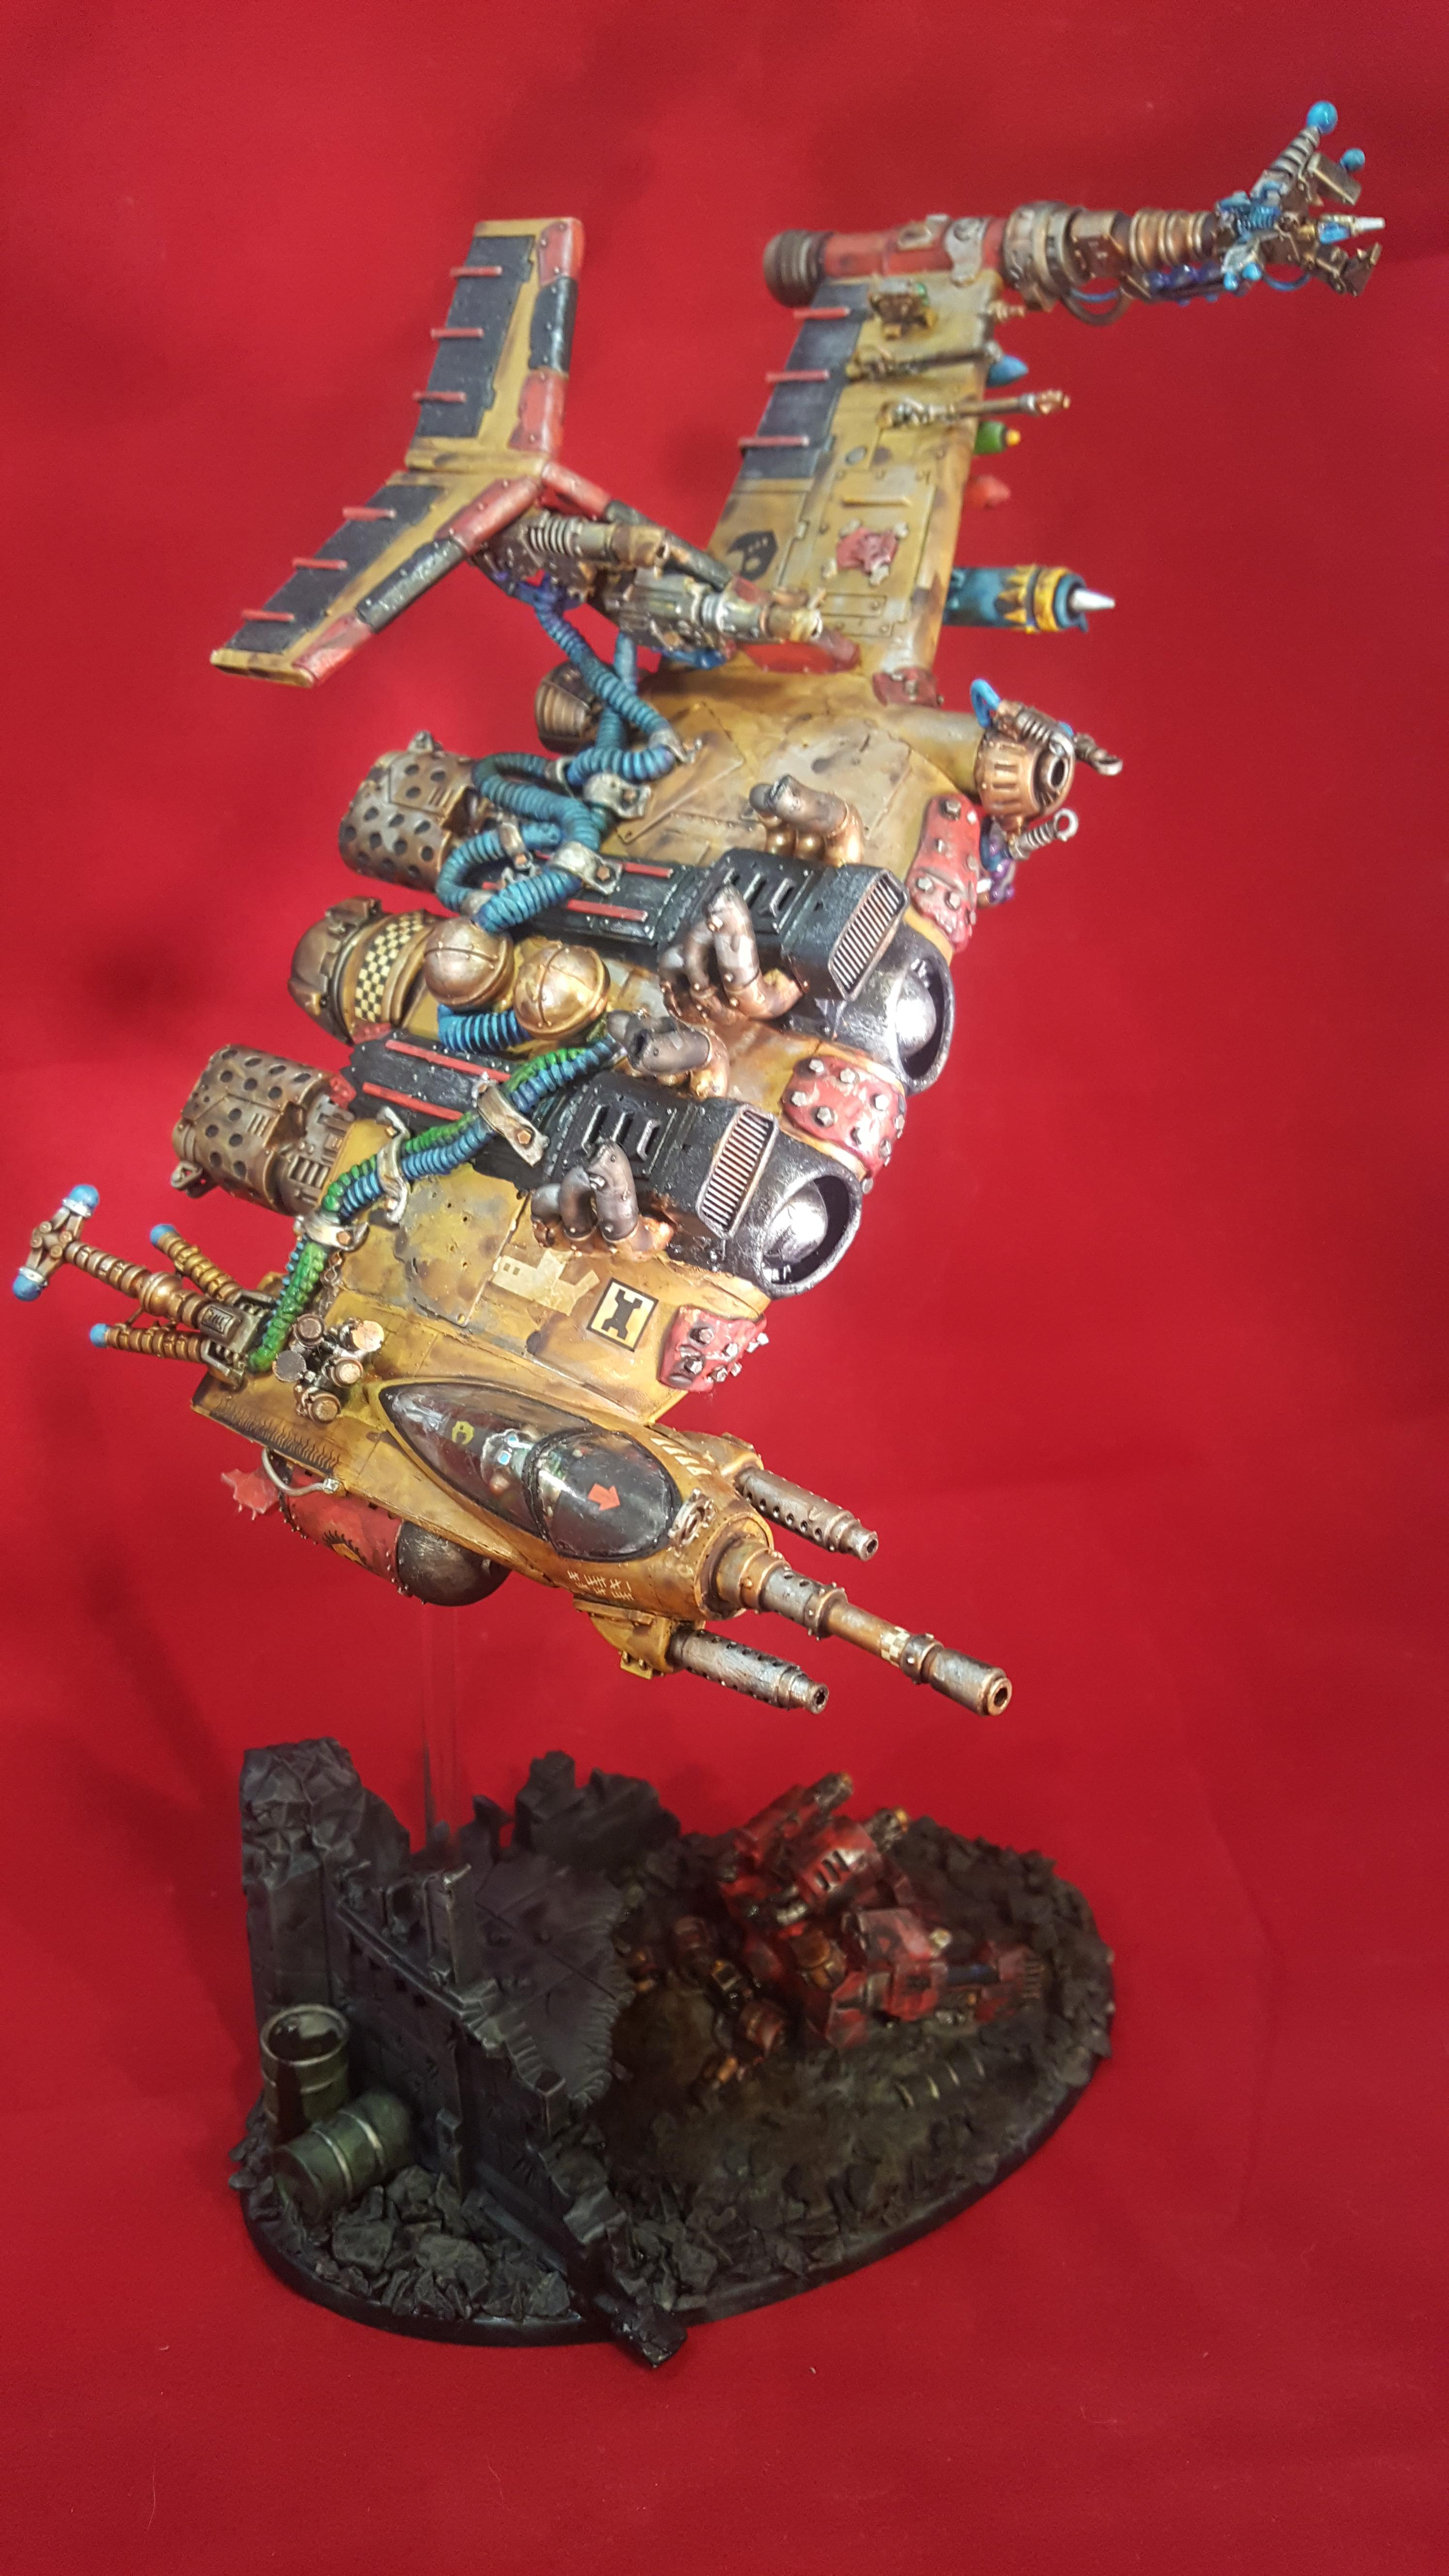 Aircraft, Bad, Dakka Dakka, Dreadnought, Jet, Looted, Mechanicum, Mob, Moons, Orks, Star Wars, Wagon, Walkers